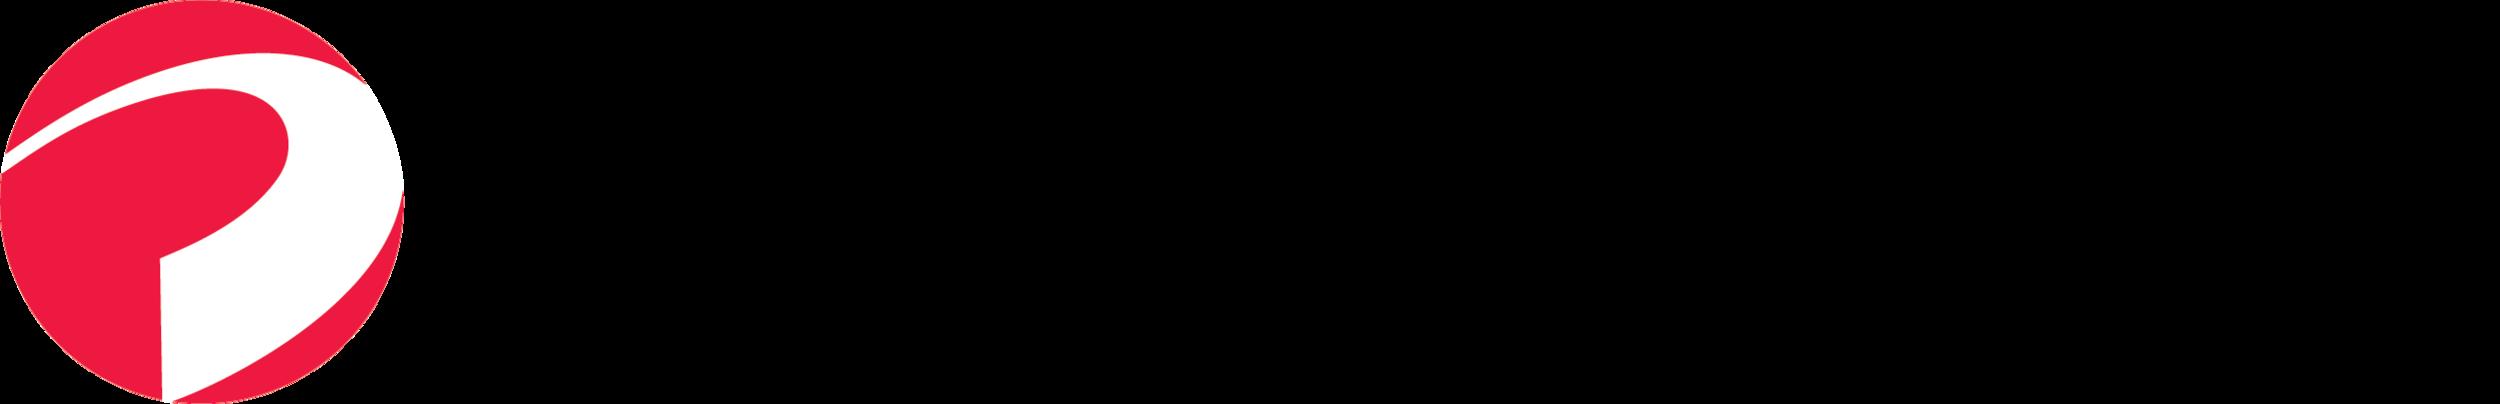 PD_Logo_Horizontal.png